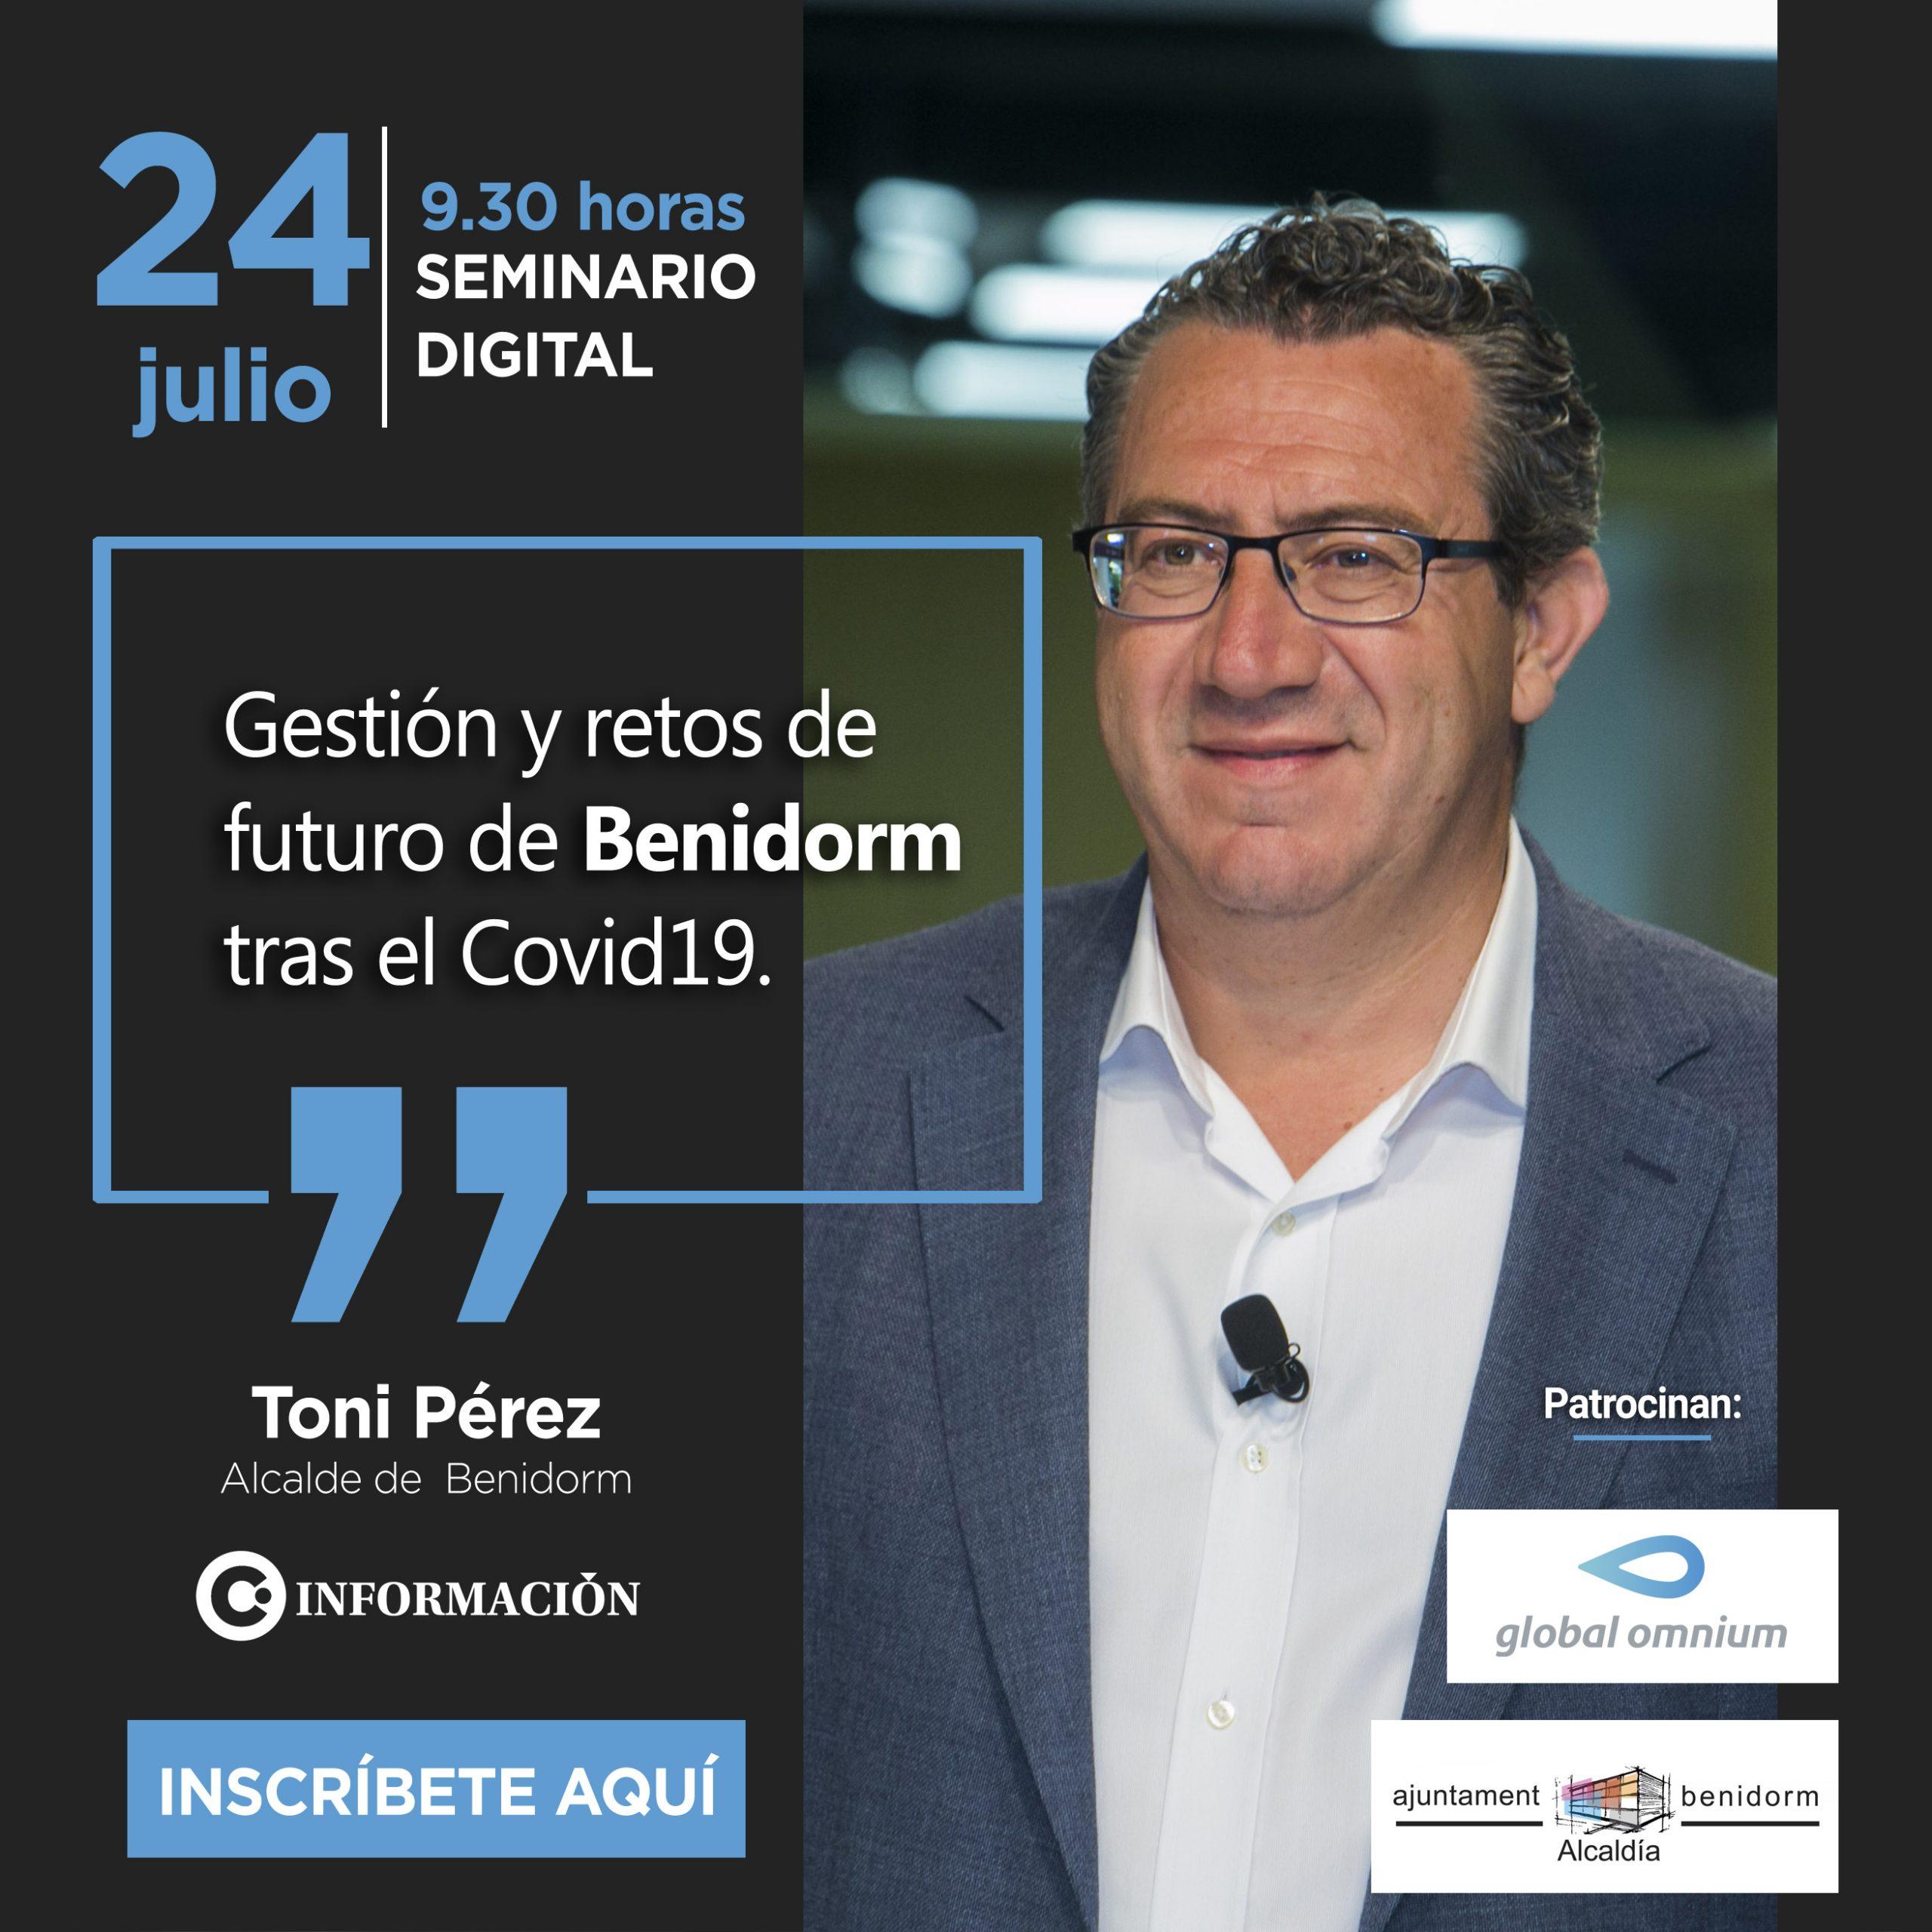 Foro Municipal de Benidorm con Toni Pérez